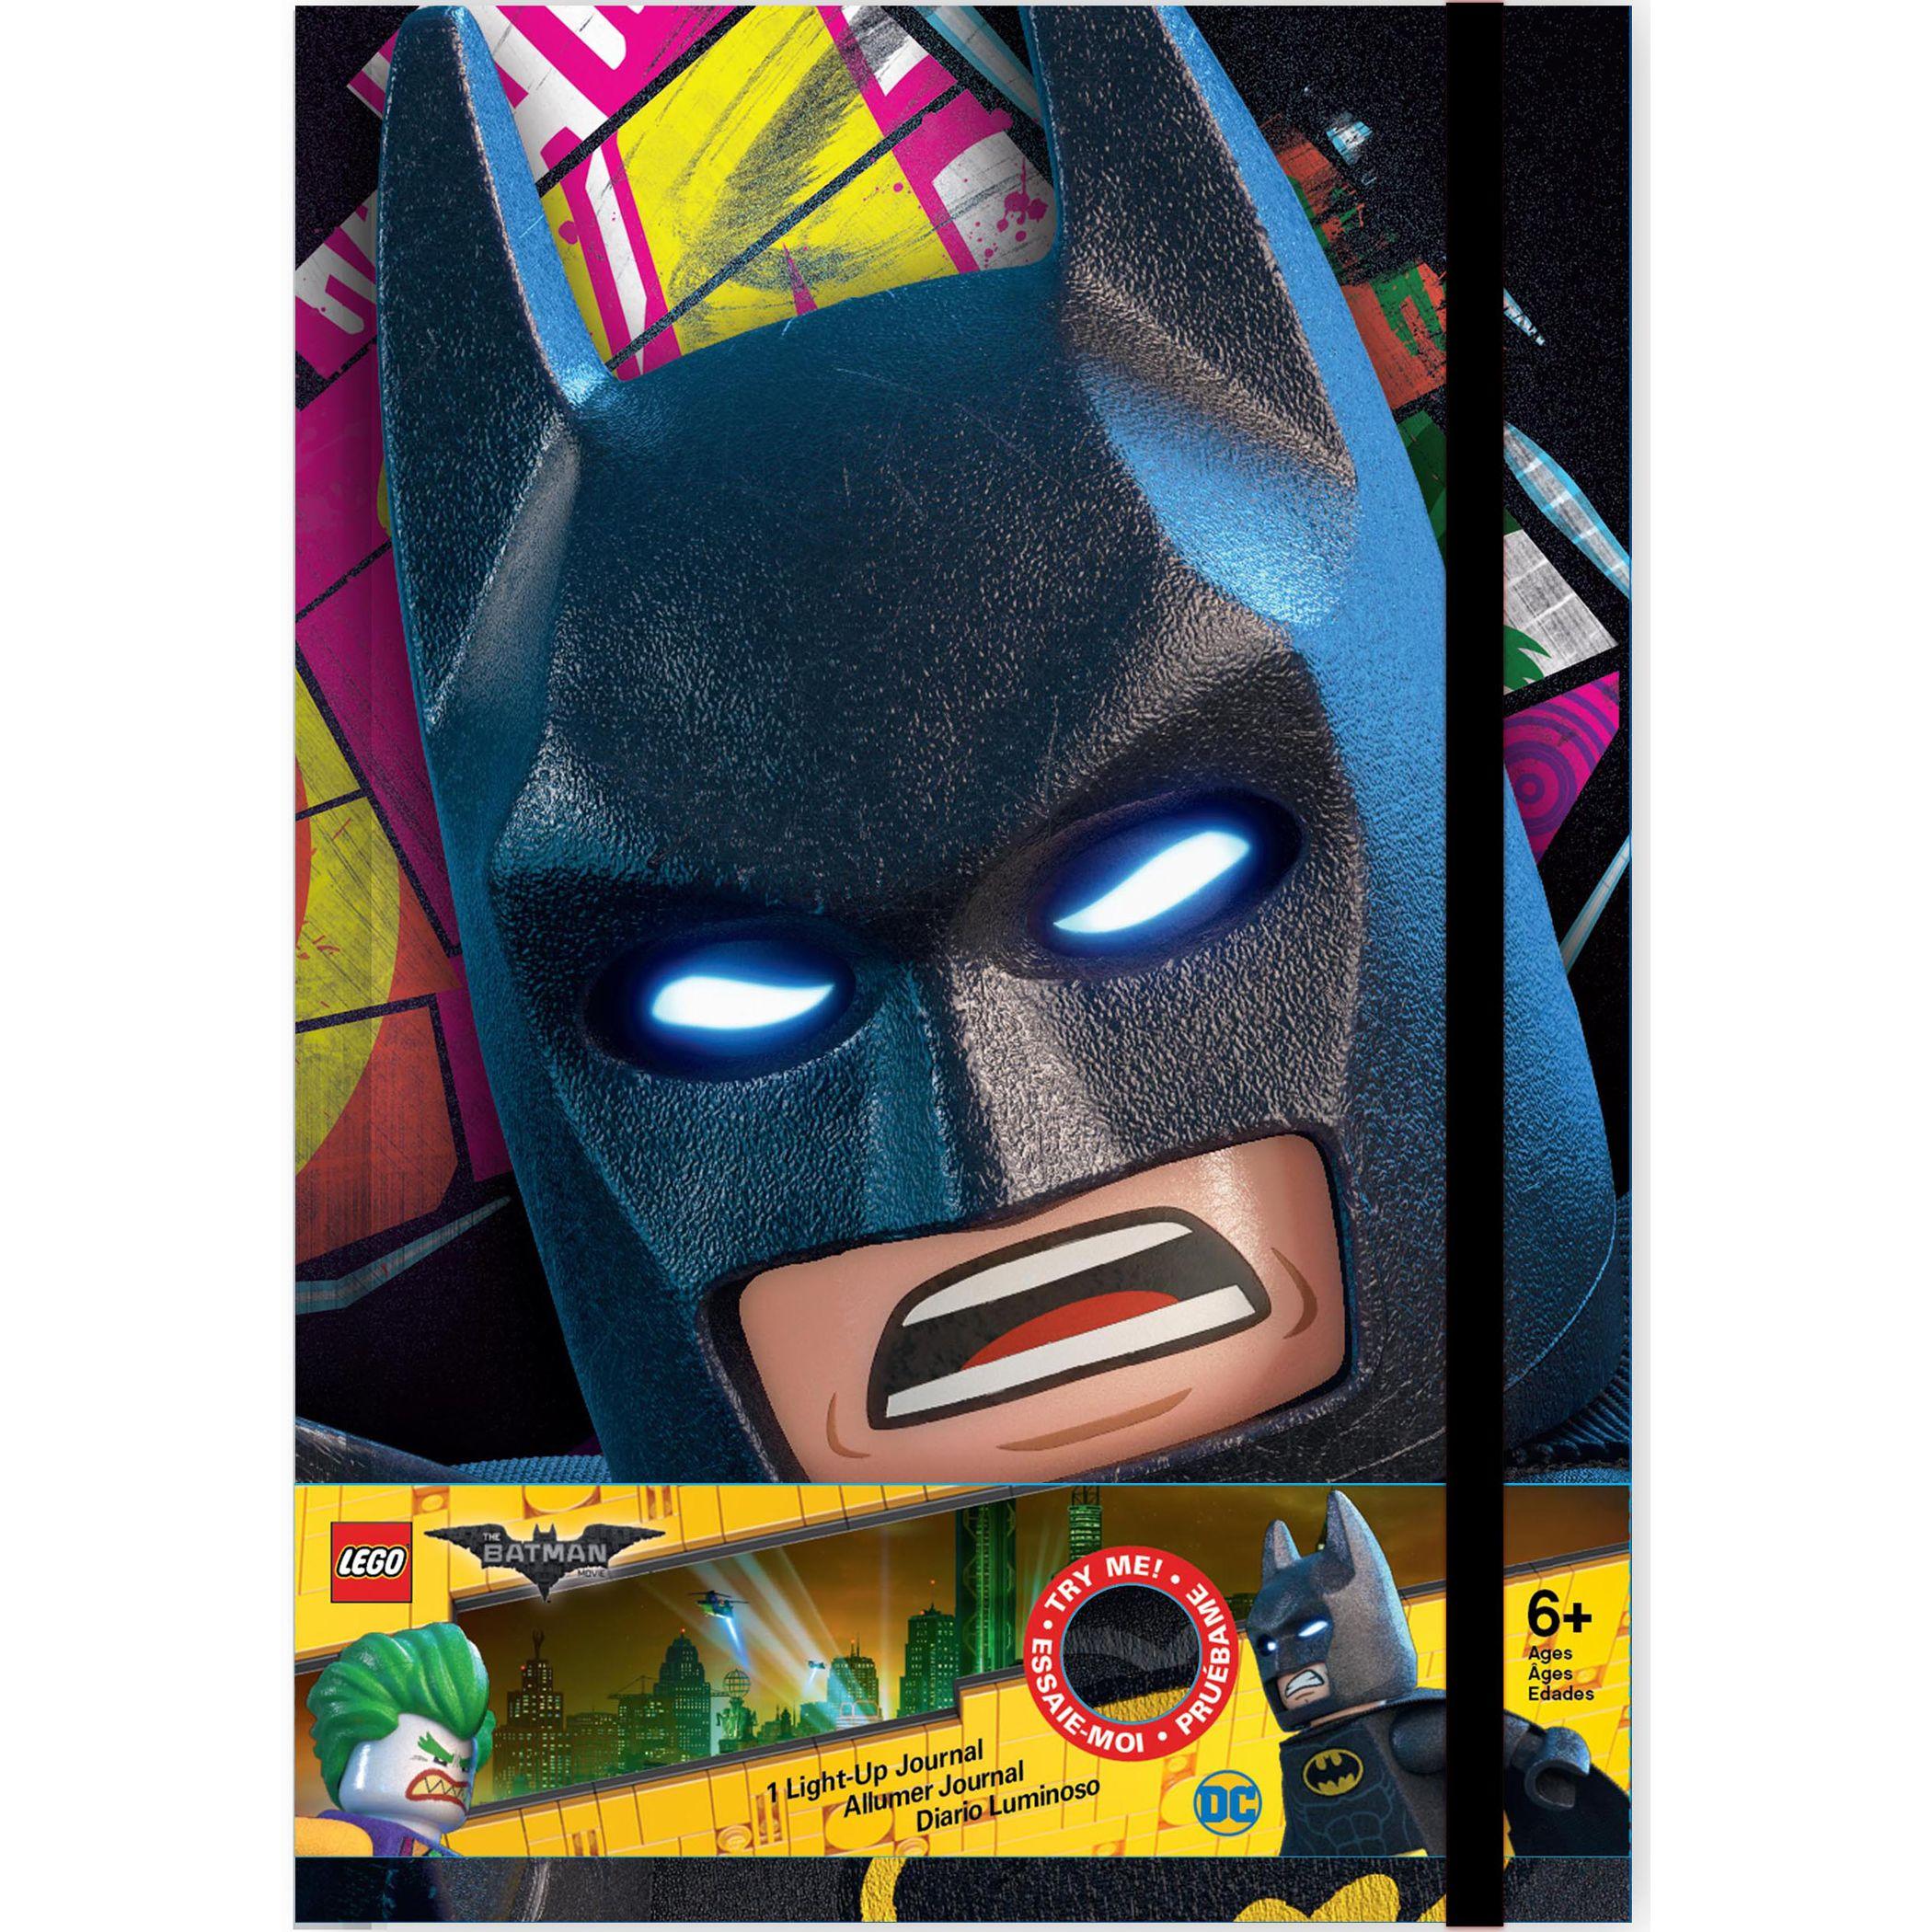 Lego LEGO The LEGO Batman Movie Light Up Journal